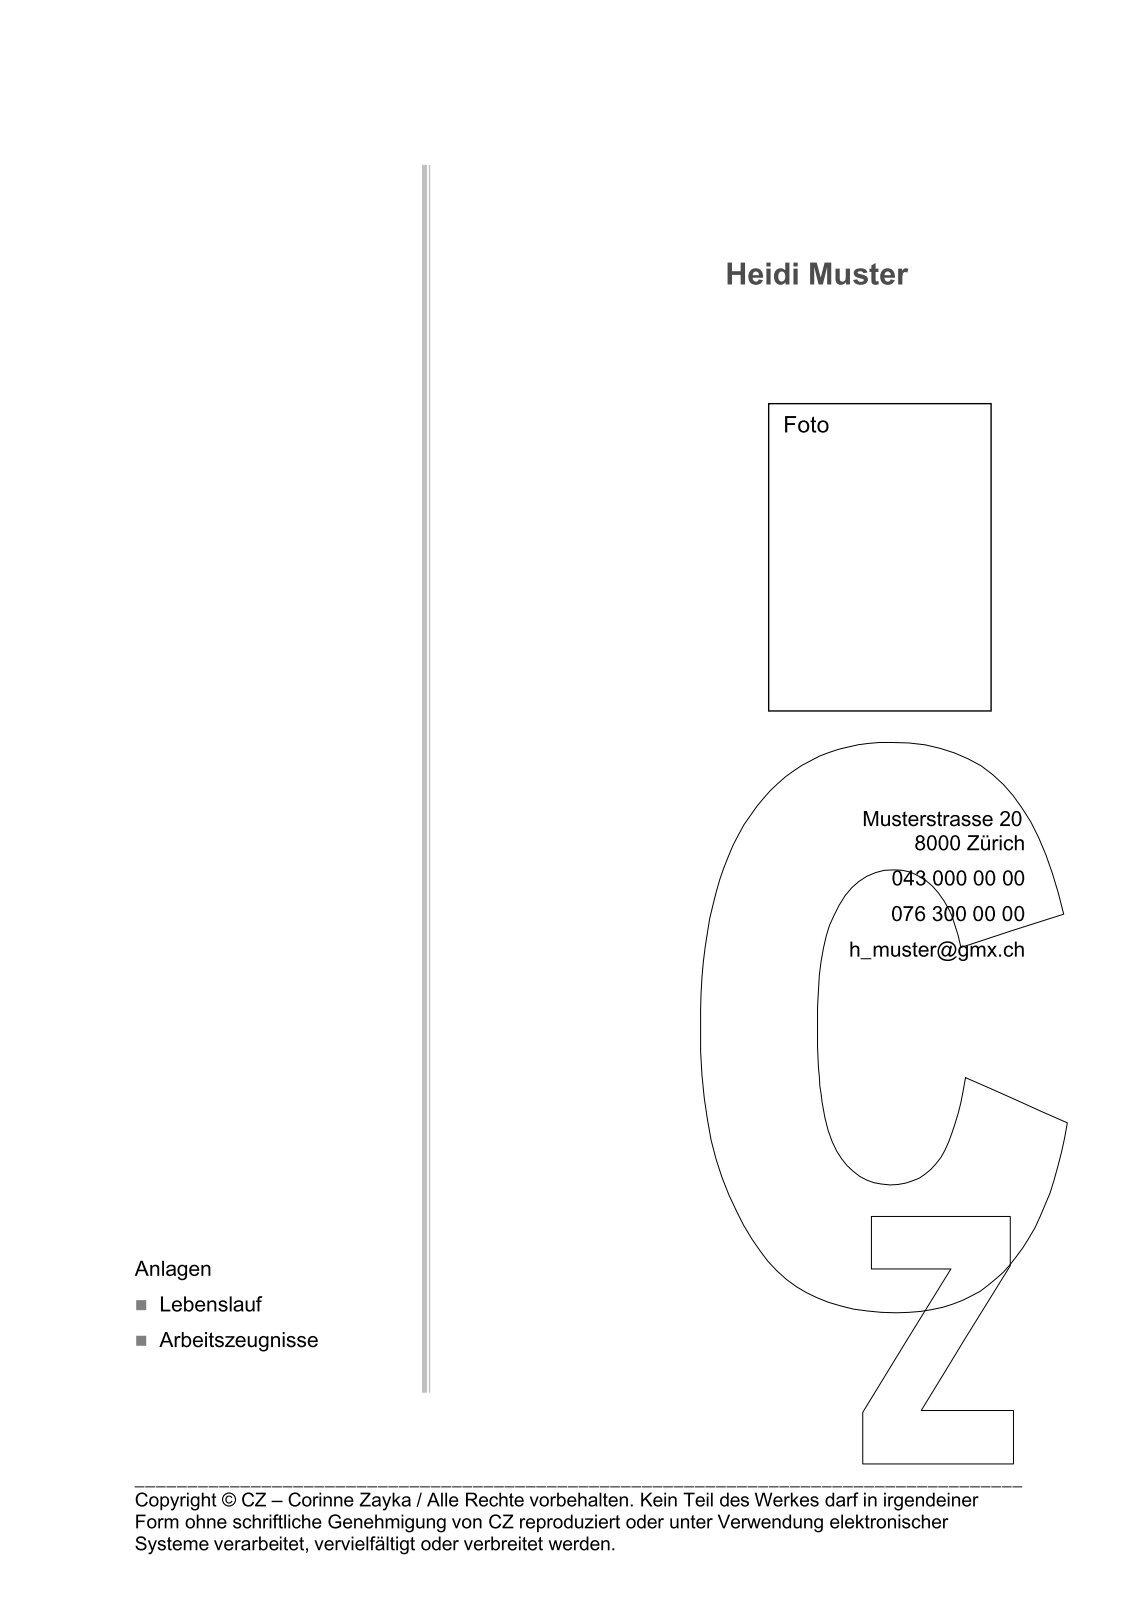 Fantastisch Lebenslauf Muster Pdf Datei Galerie - Entry Level Resume ...